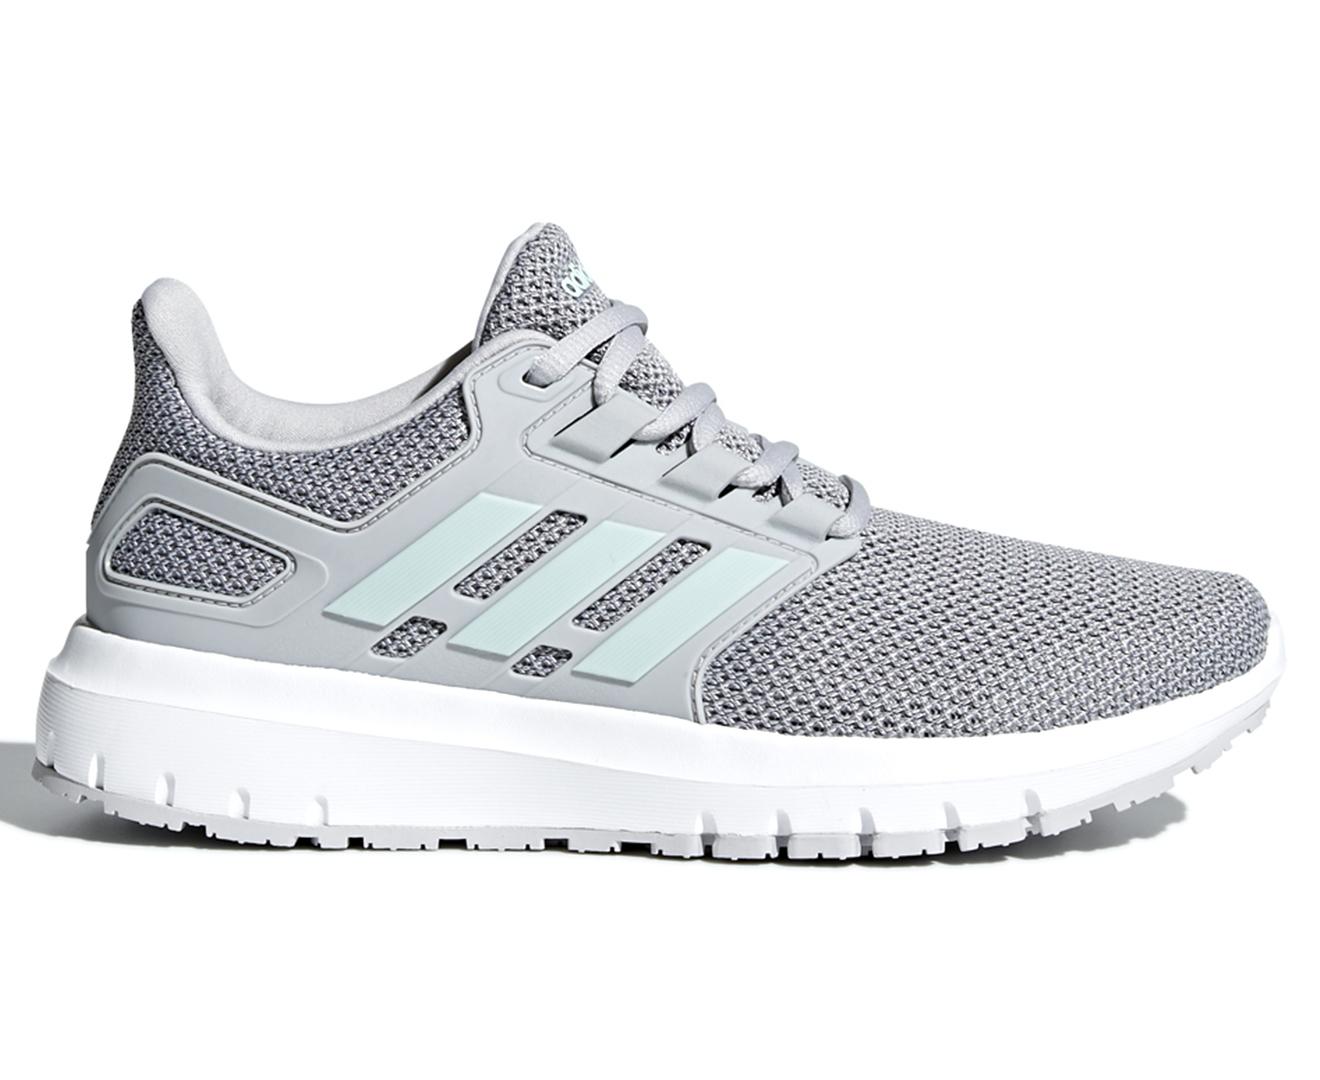 quality design f5b0a 57910 Adidas Womens Energy Cloud 2 Shoe - Grey TwoAsh Green  Catch